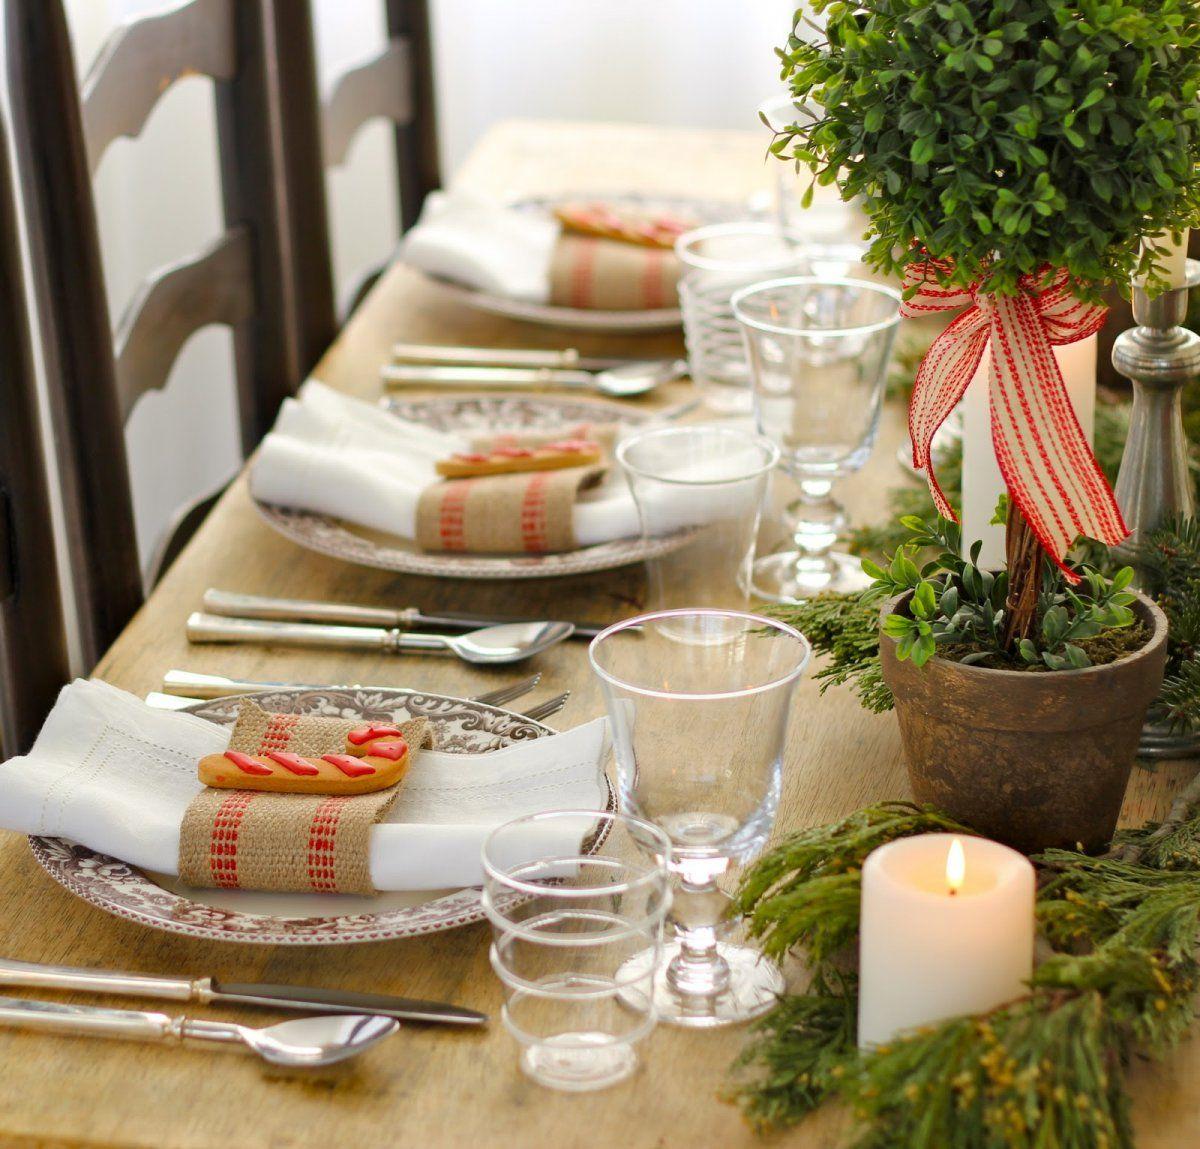 Casual But Elegant Christmas Table Setting Via Jenny Steffens Hobick Holiday